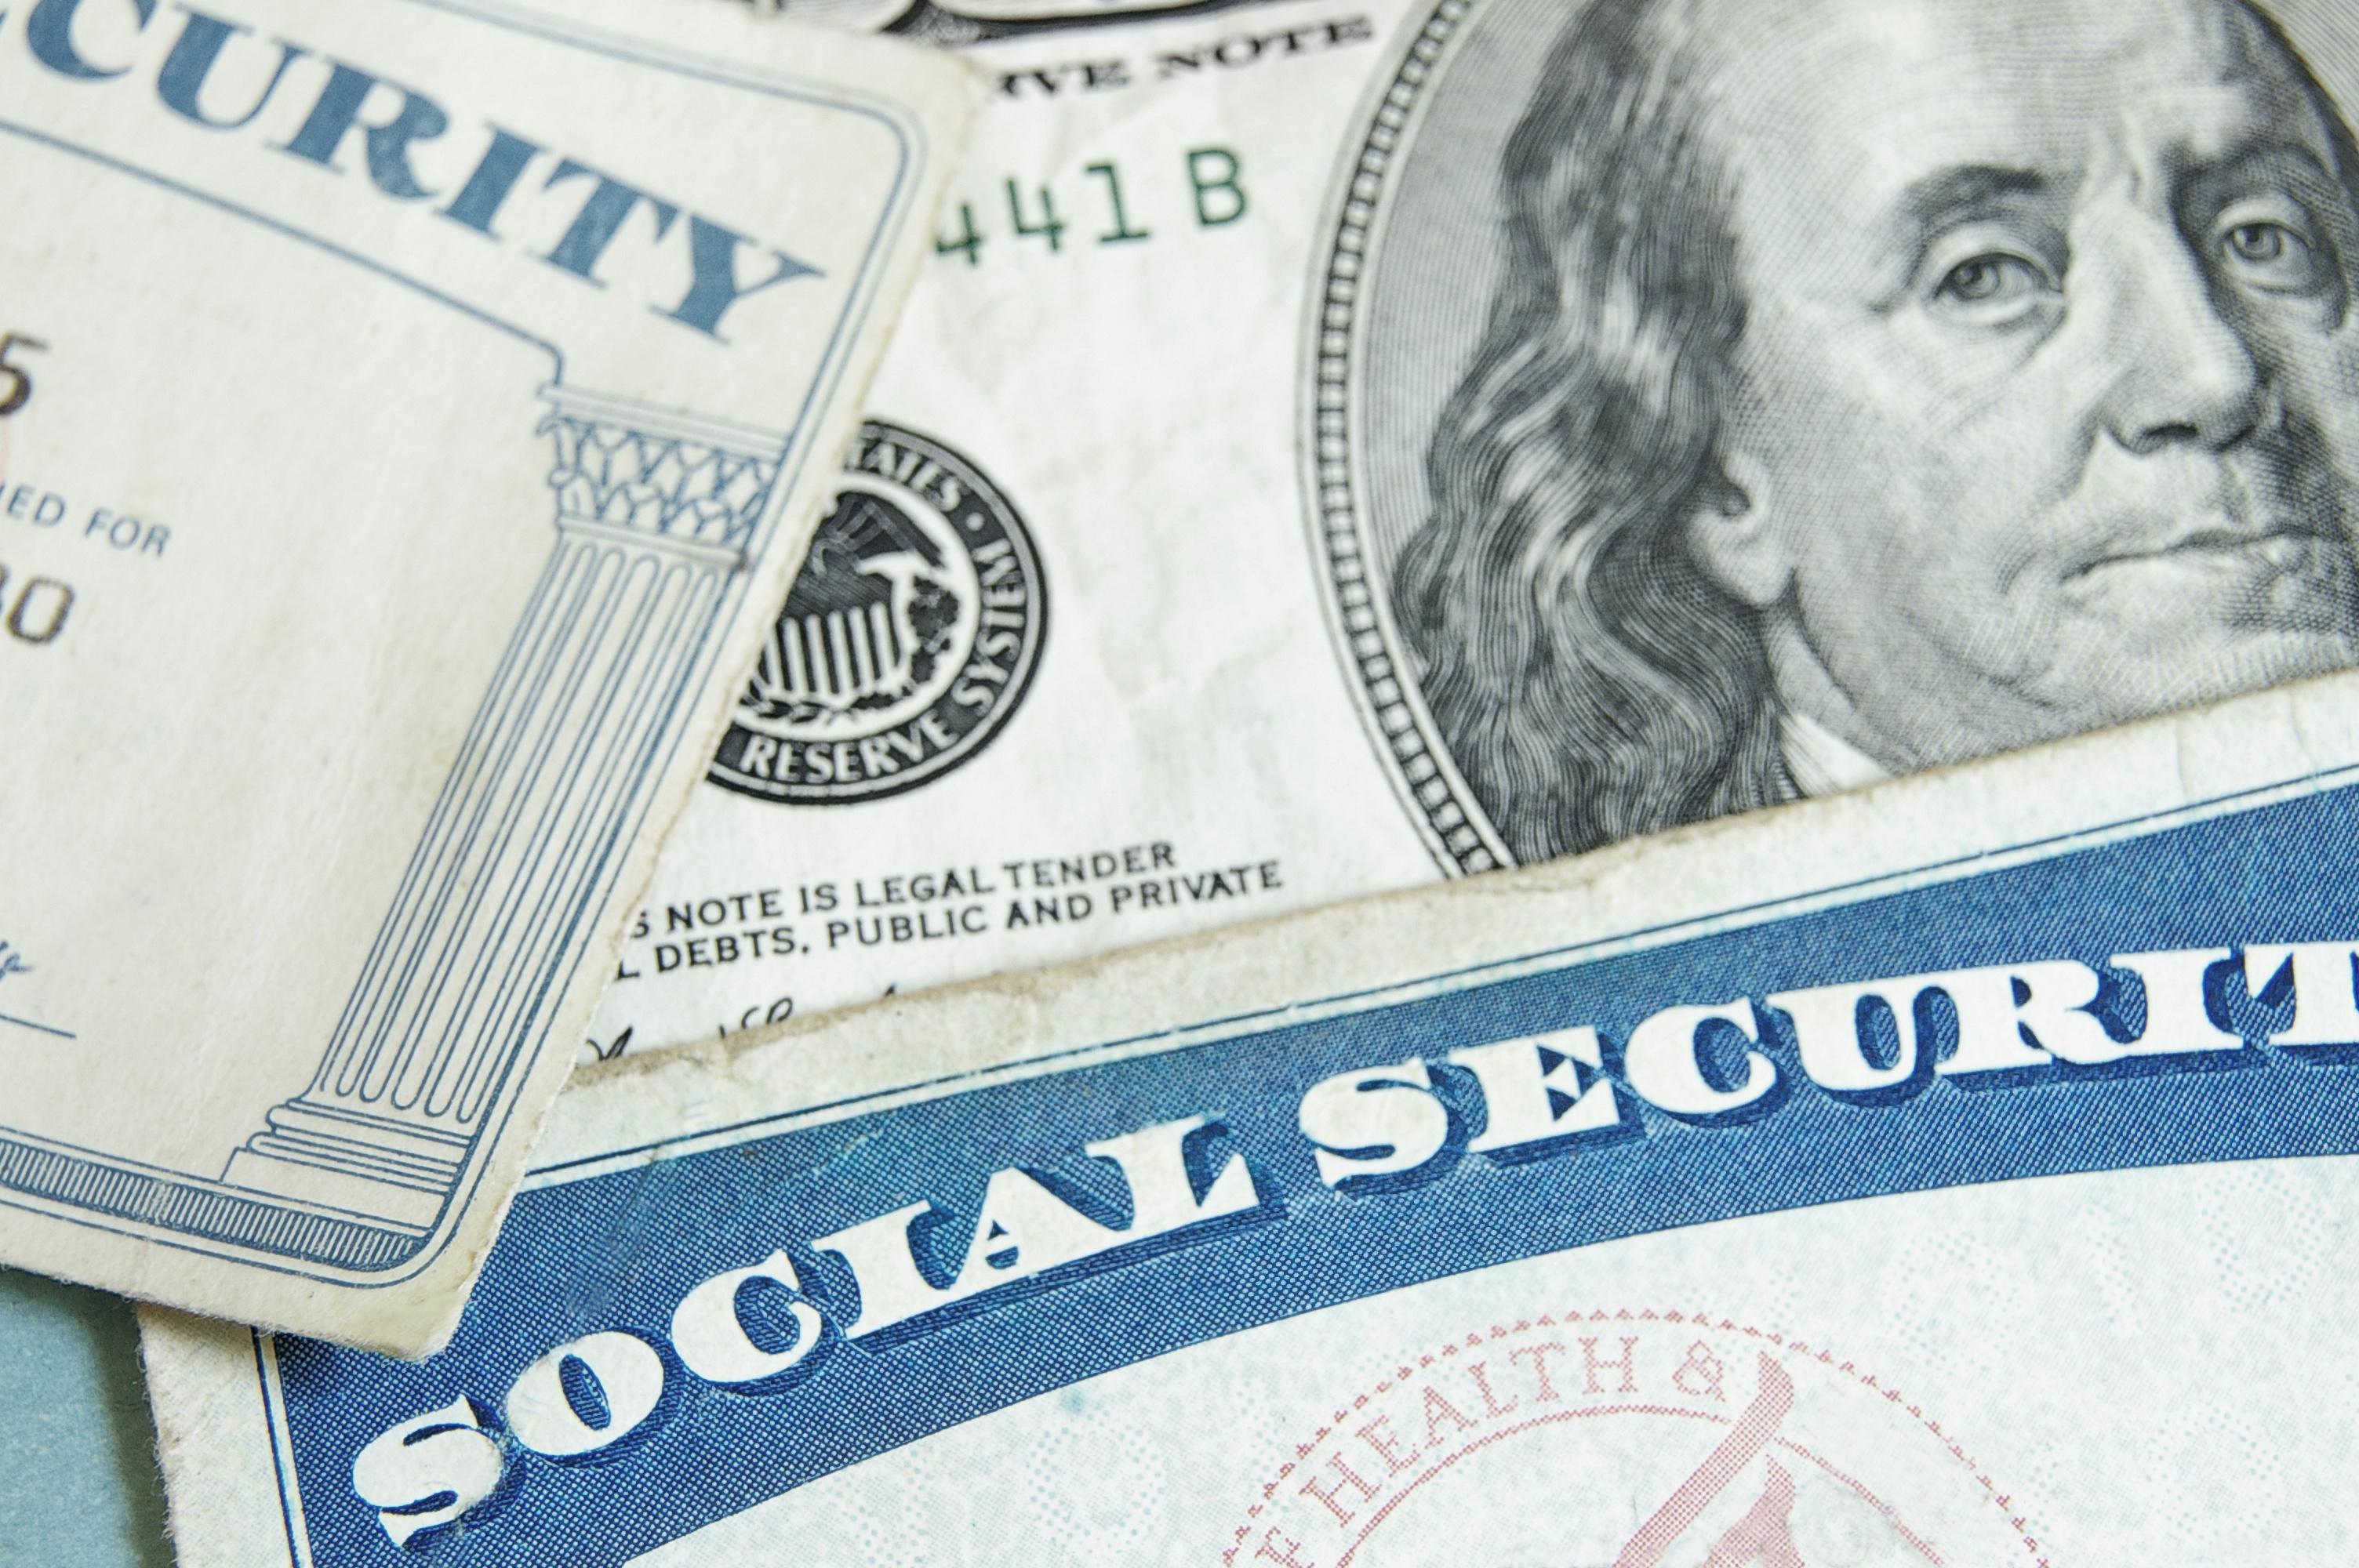 Social Security cards lying atop a hundred dollar bill.